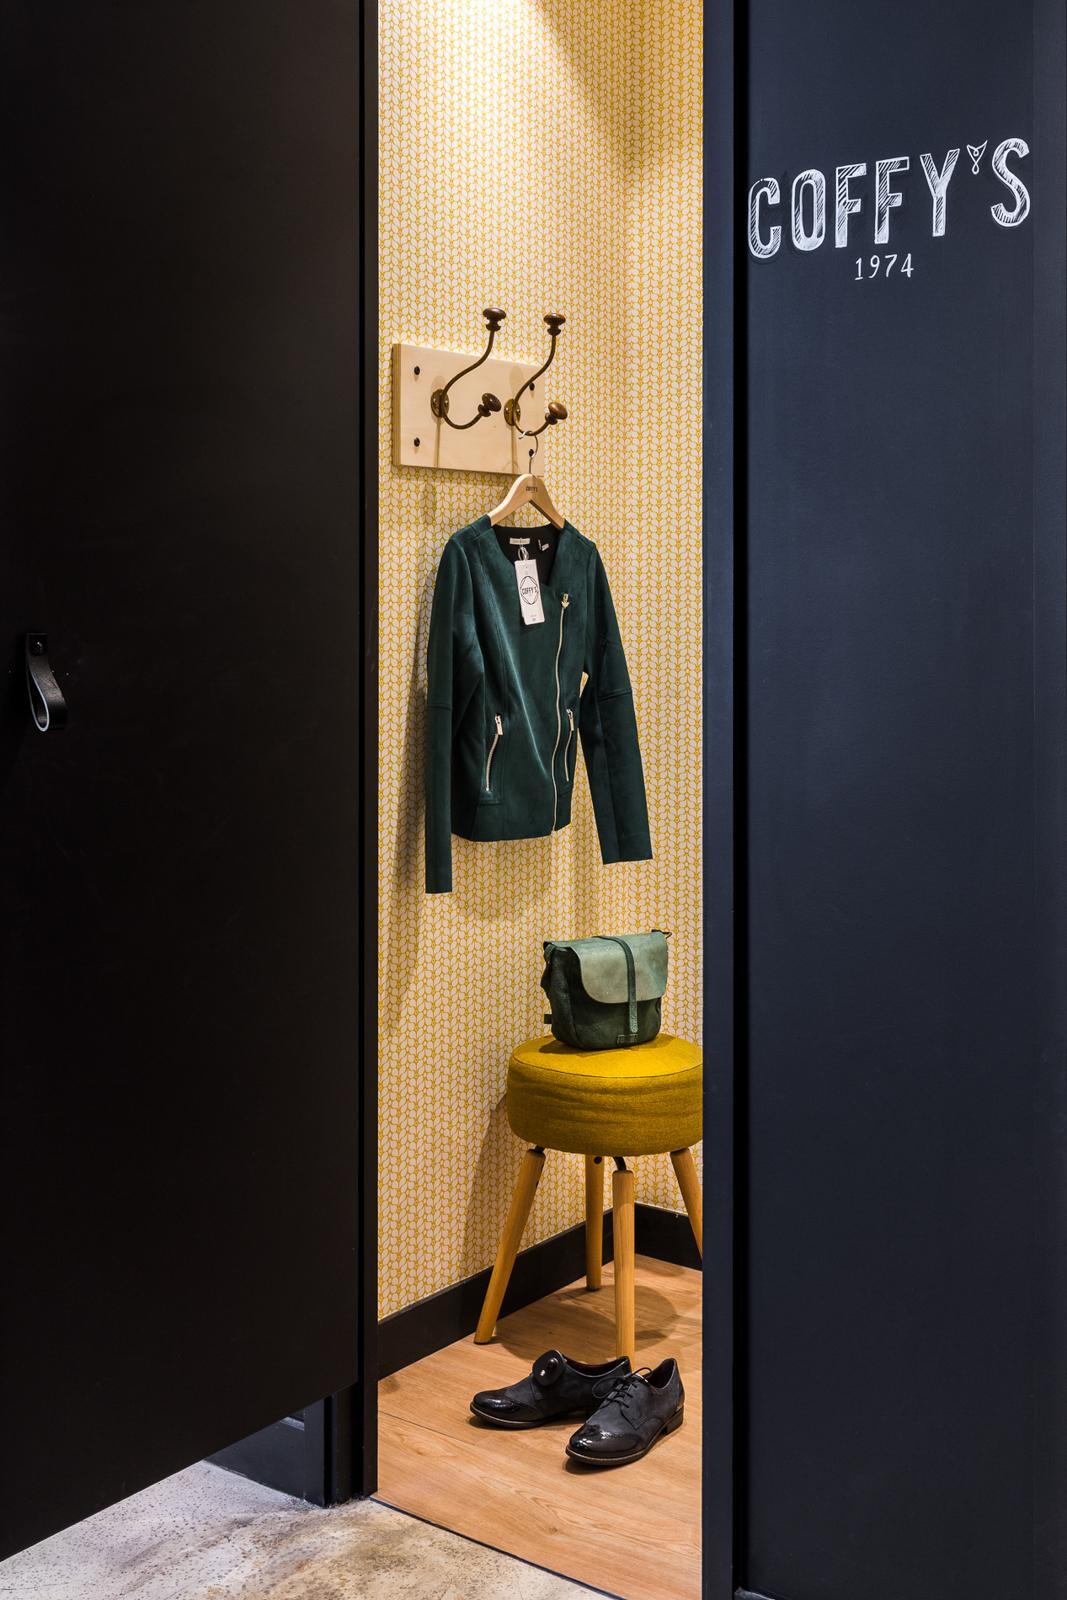 boutique_coffys_photographie_commerce -6.jpg